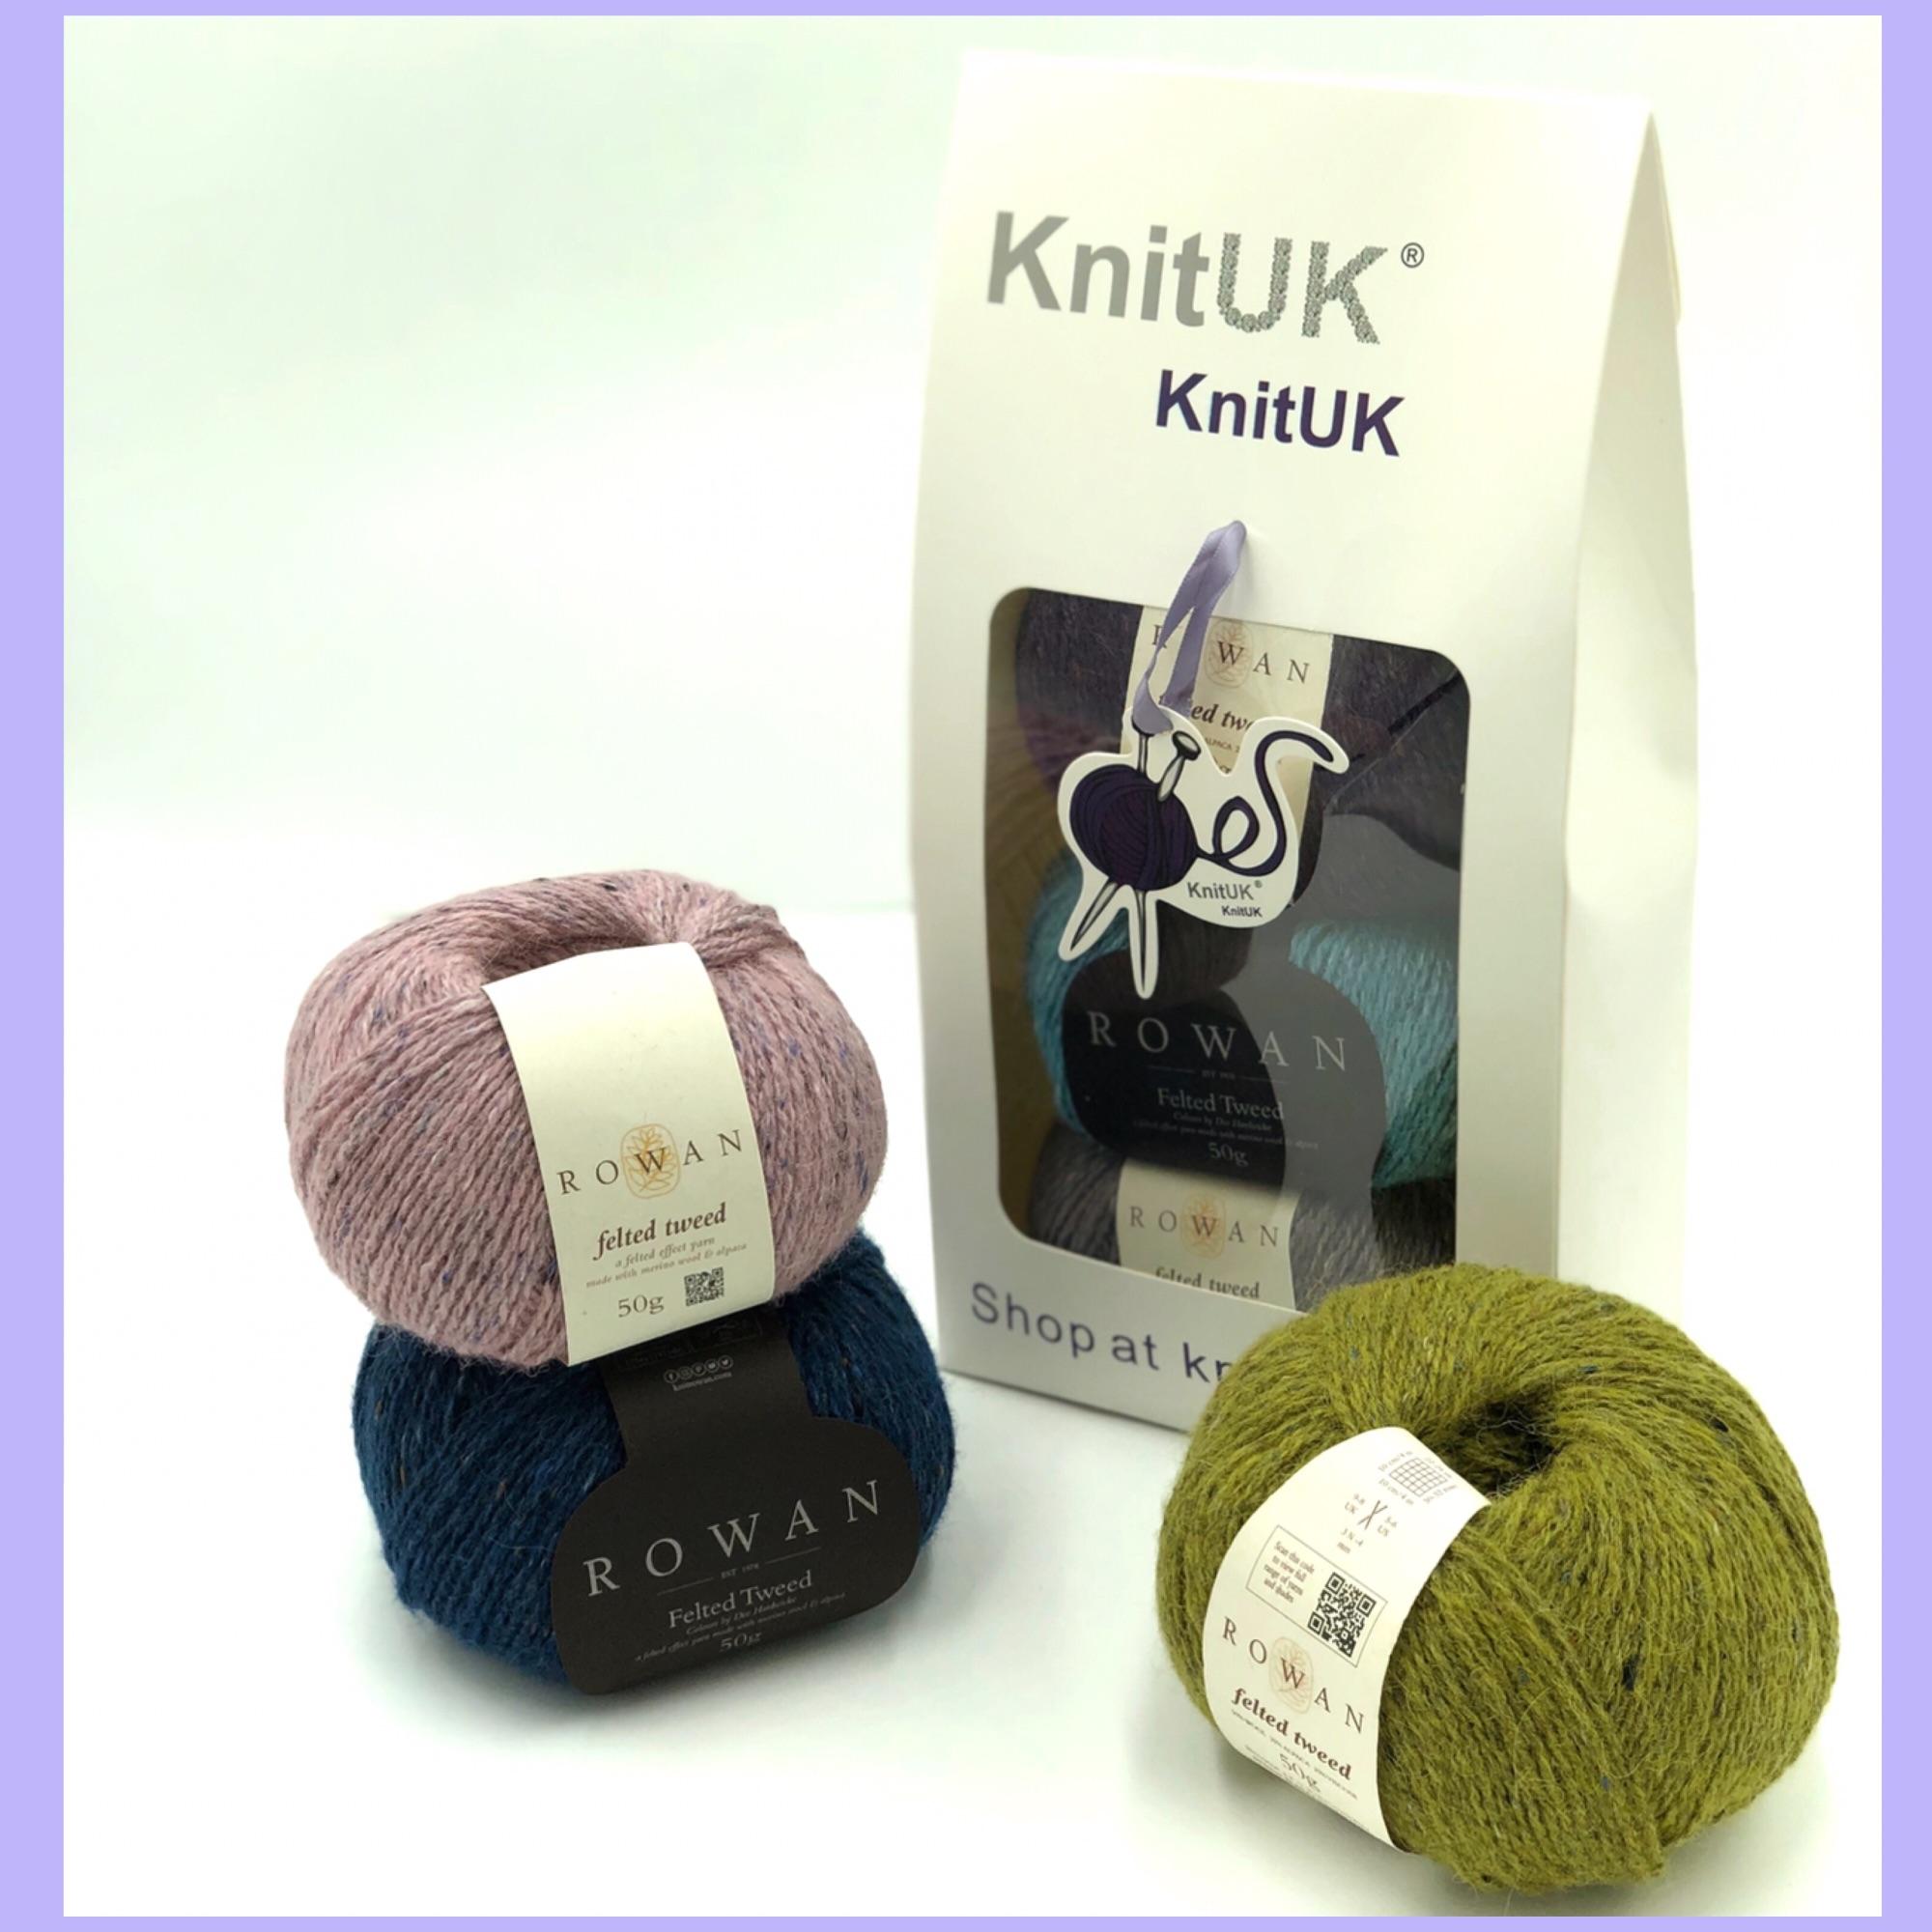 rowan felt tweed knitting yarn 3 balls knitUK box